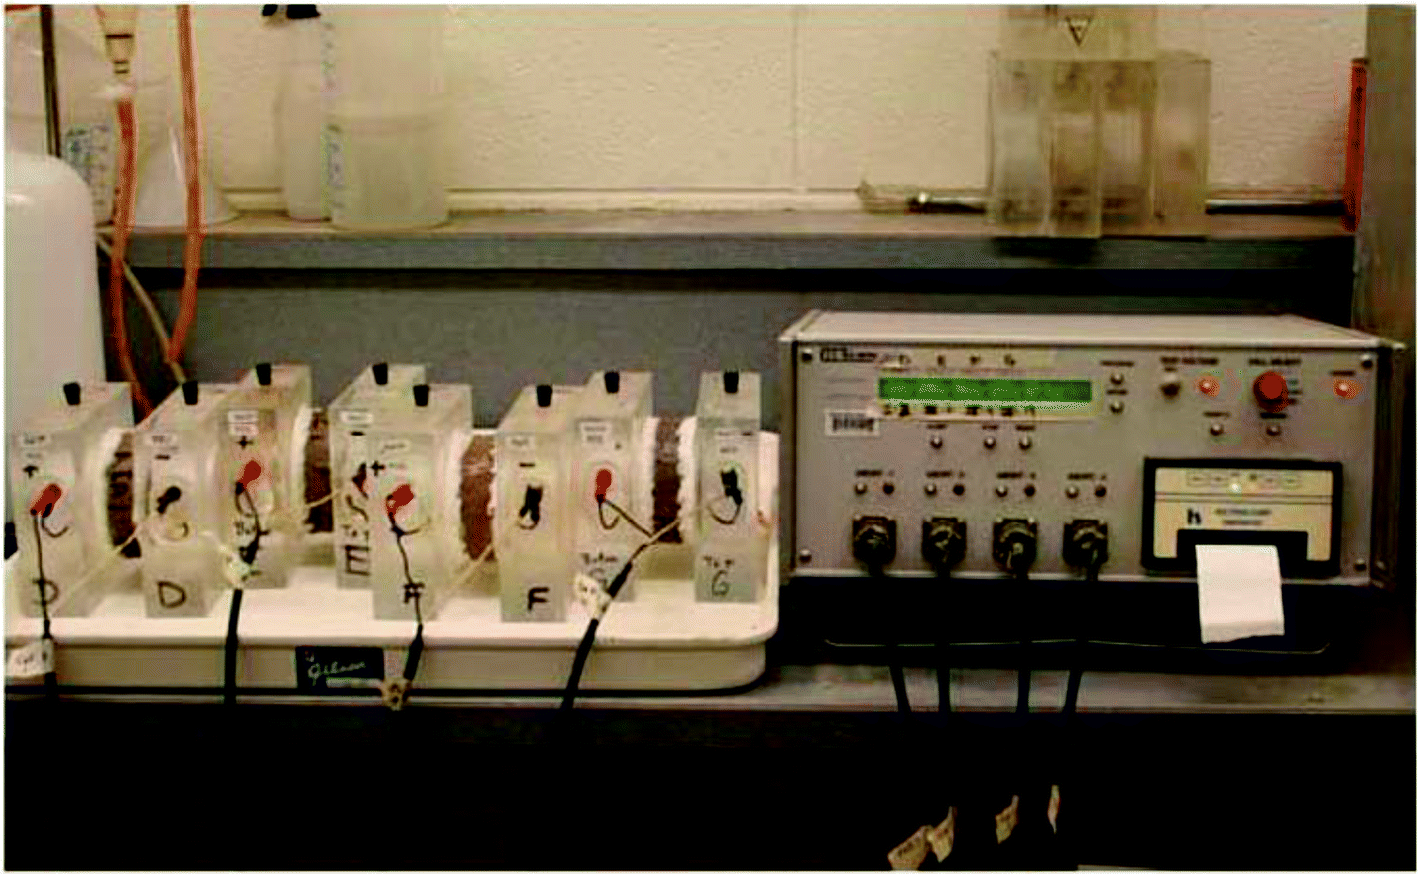 rapid chloride permeability test procedure